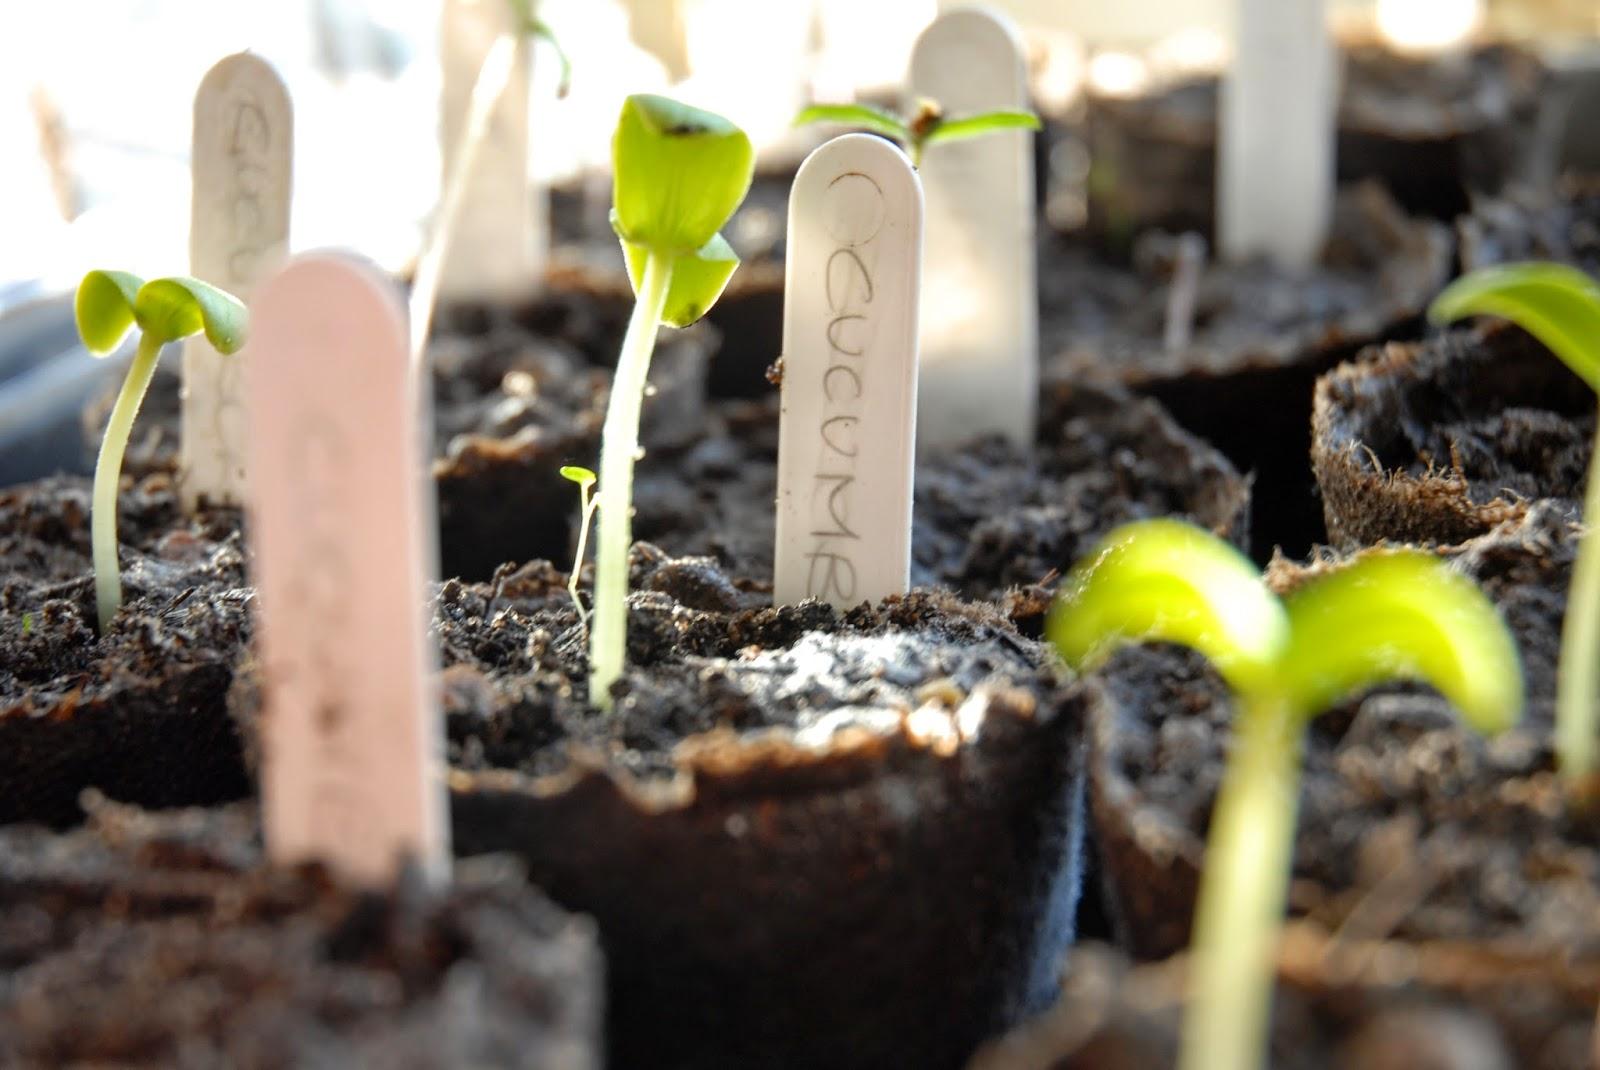 Sharing seeds promotes biodiversity